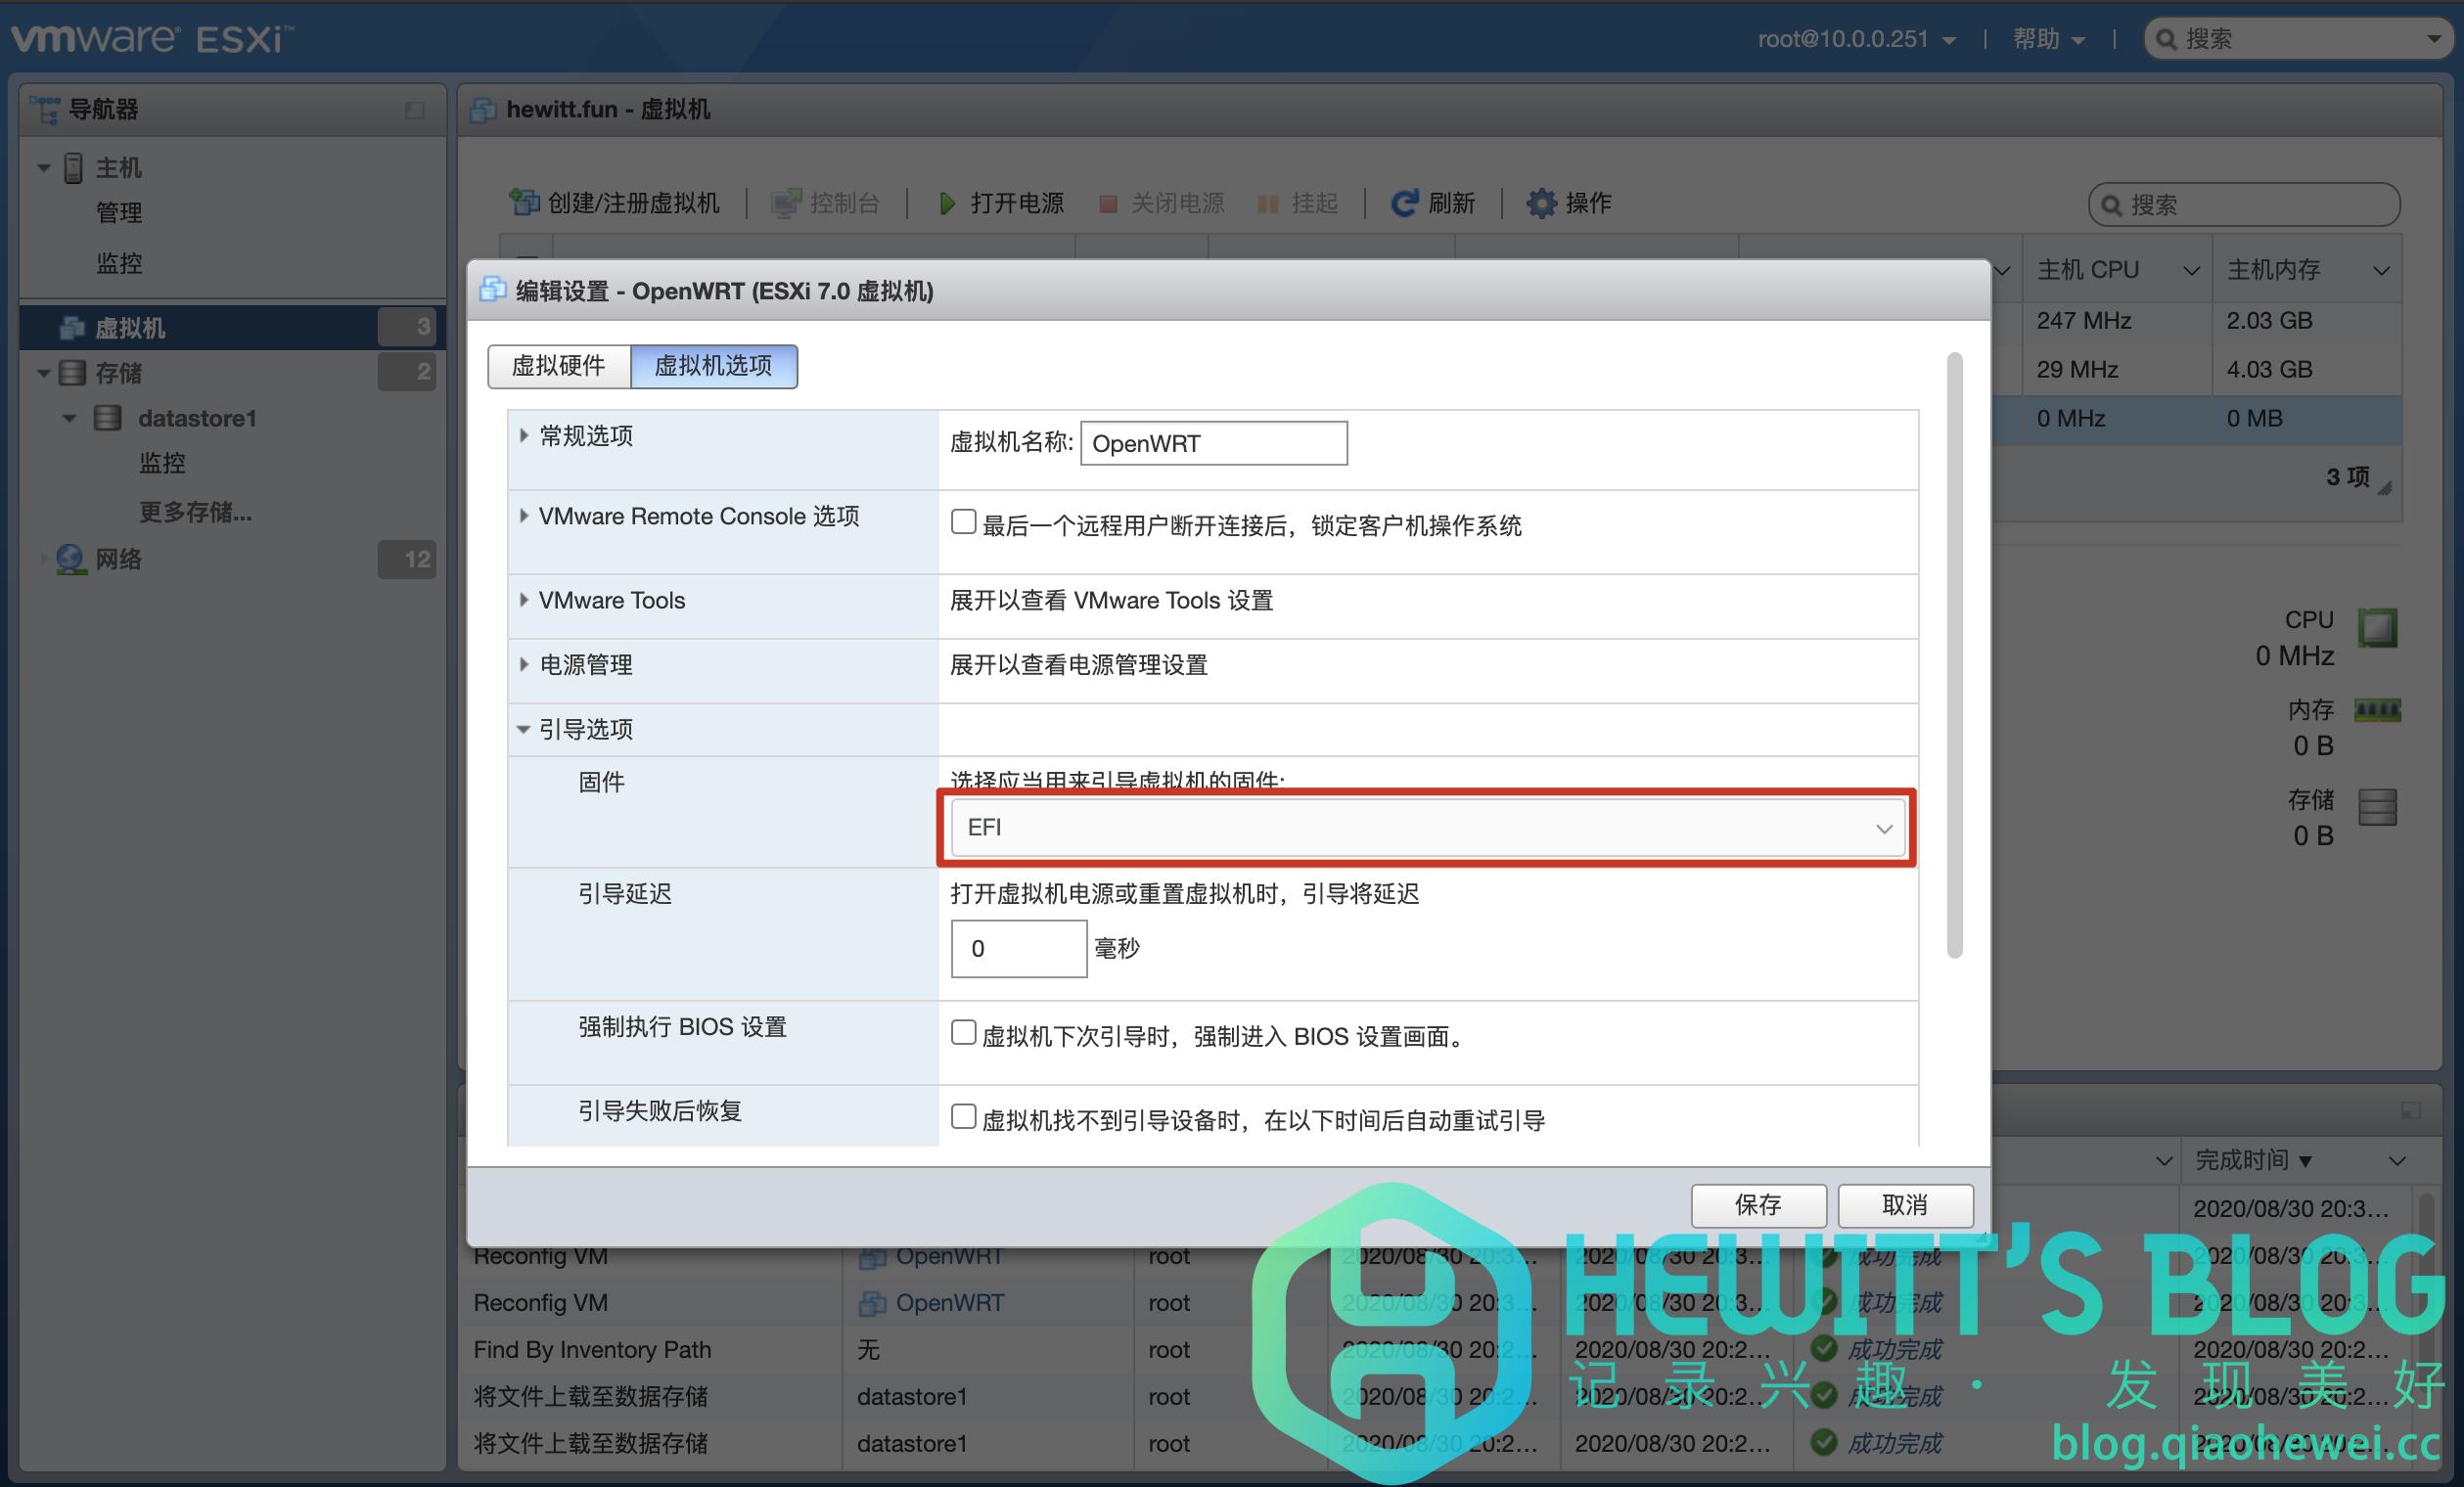 ESXI安装OpenWRT & LEDE软路由部署指南(附镜像下载)插图21